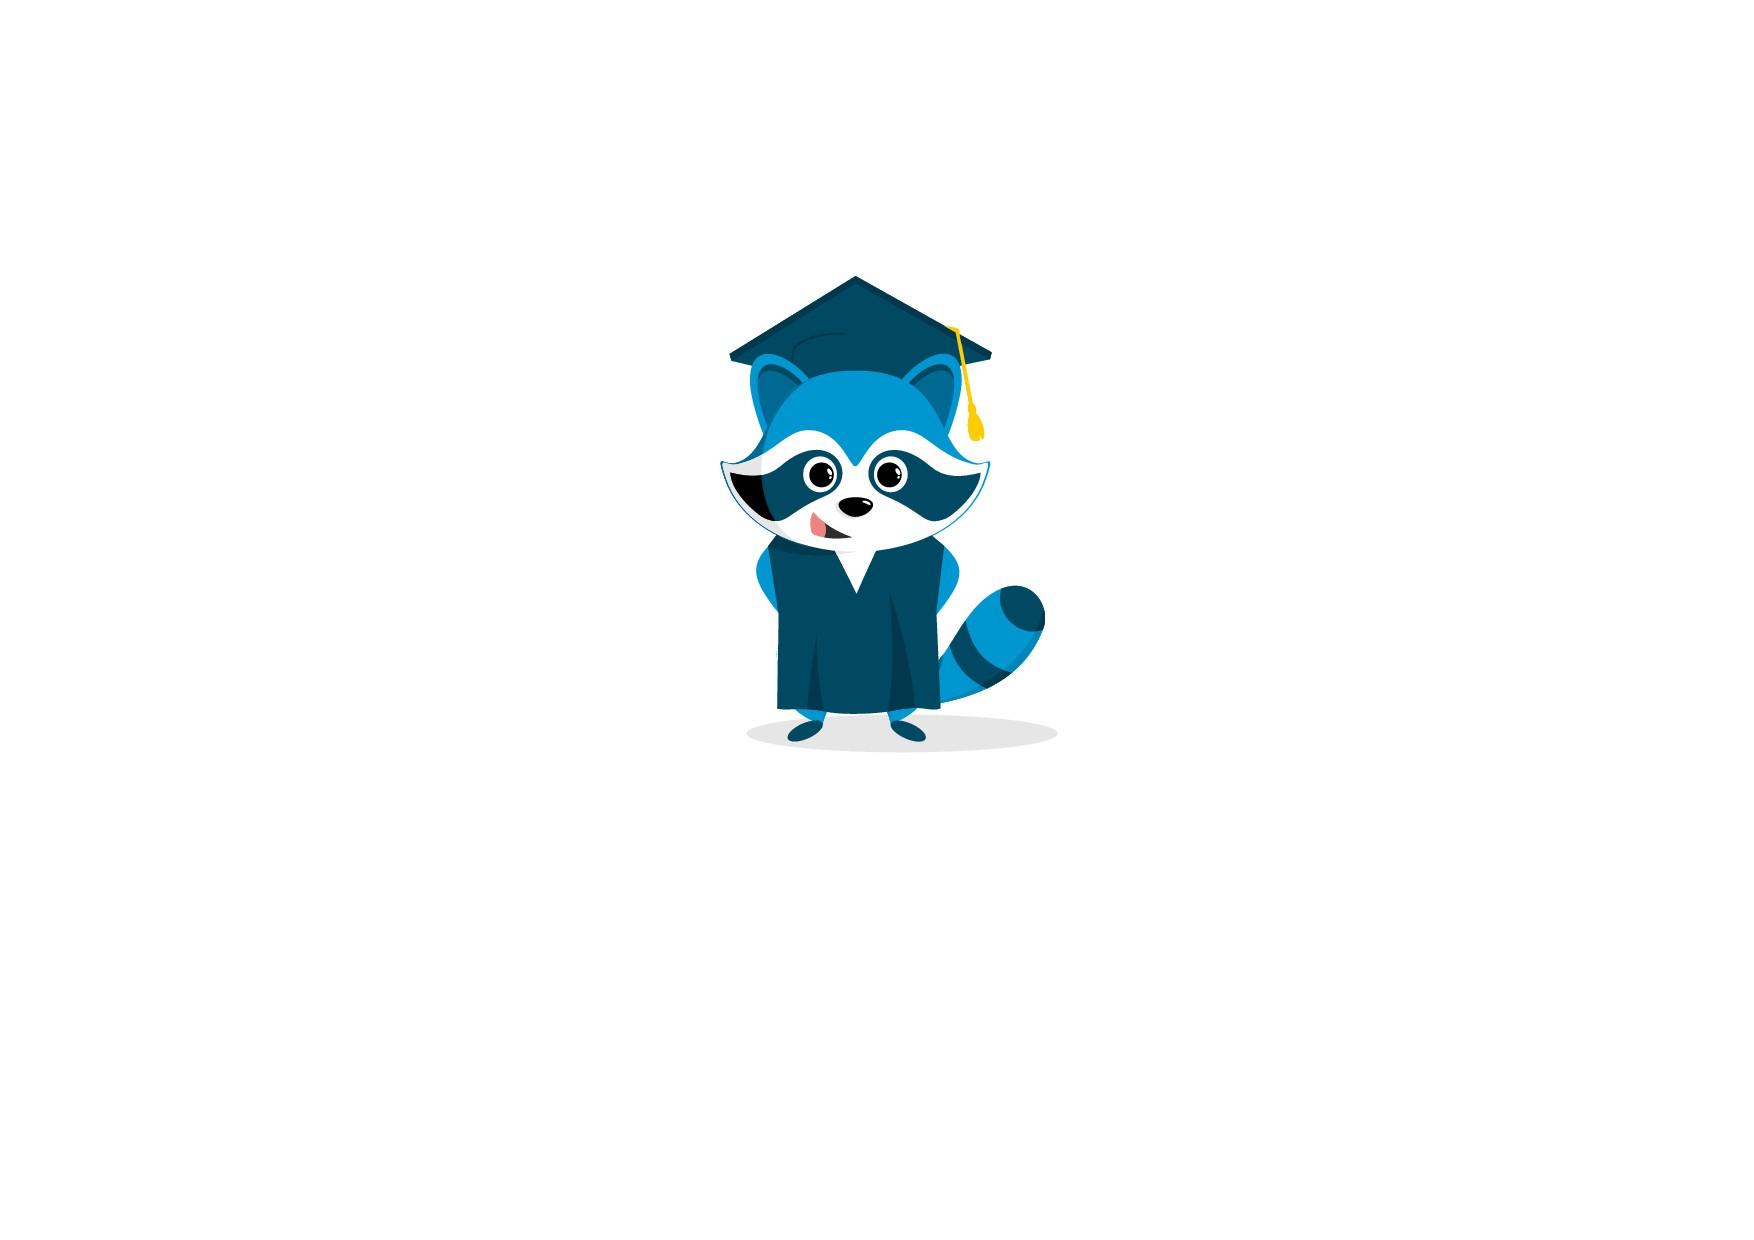 Create a lovable mascot for an education technology company!